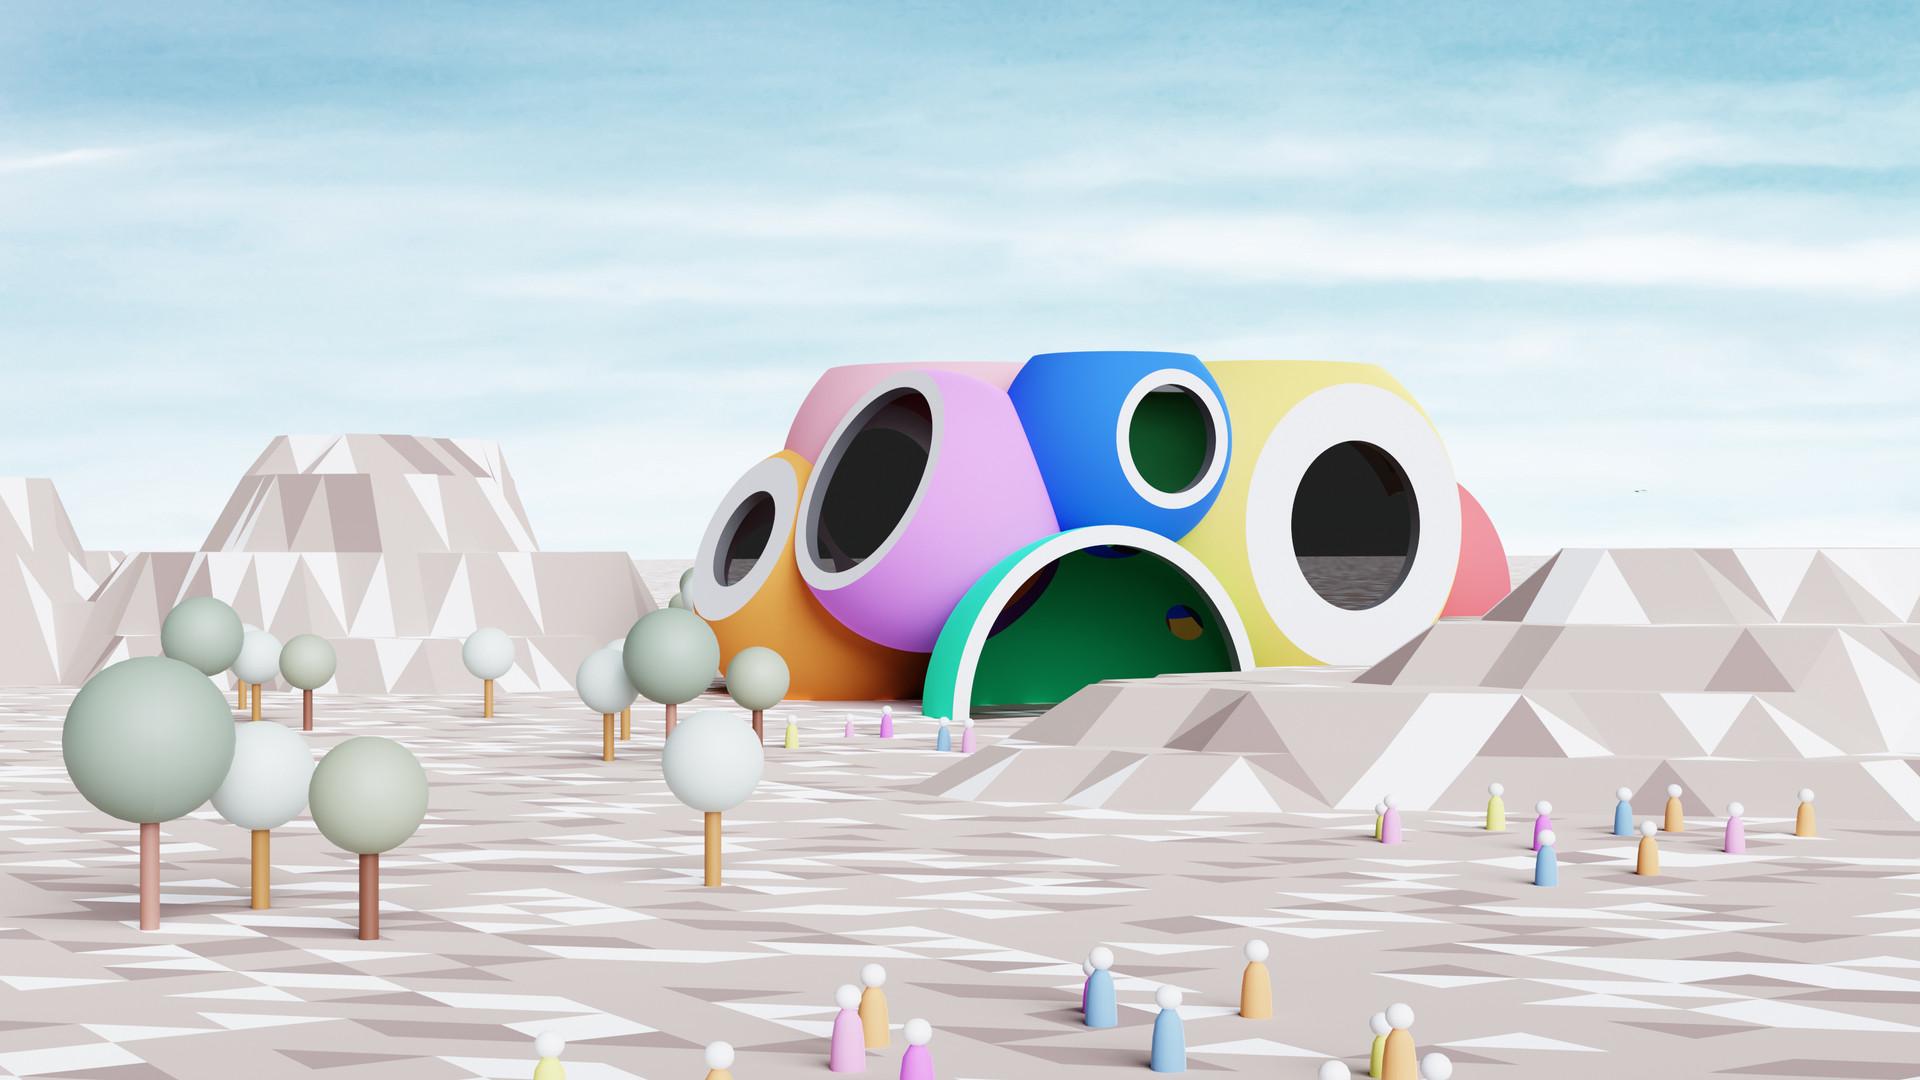 Trimmed Spheres